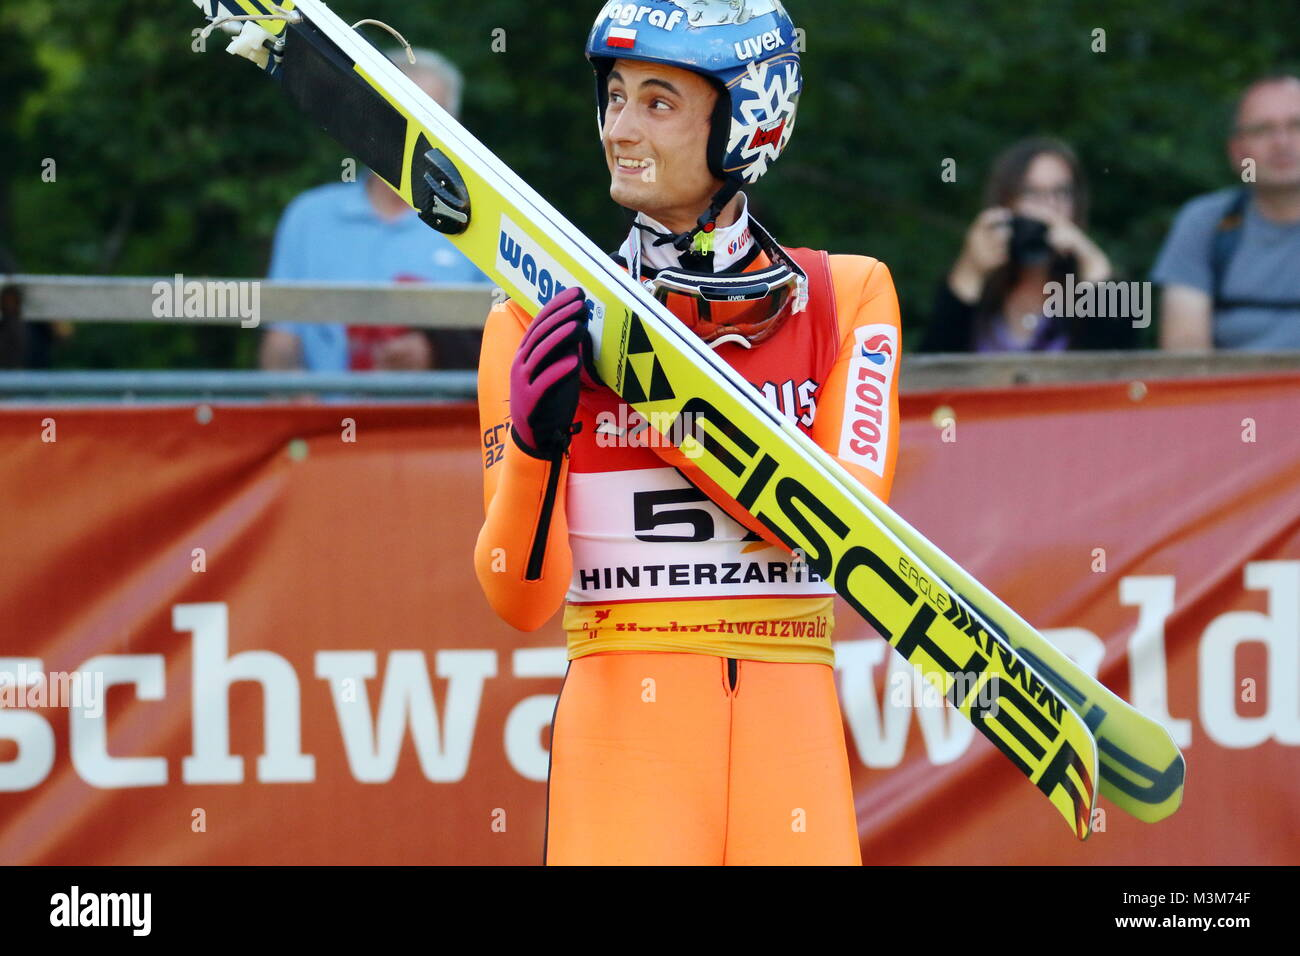 Maciej Kot Polen Pol Bei Der Qualifikation Fis Sommer Grand Prix